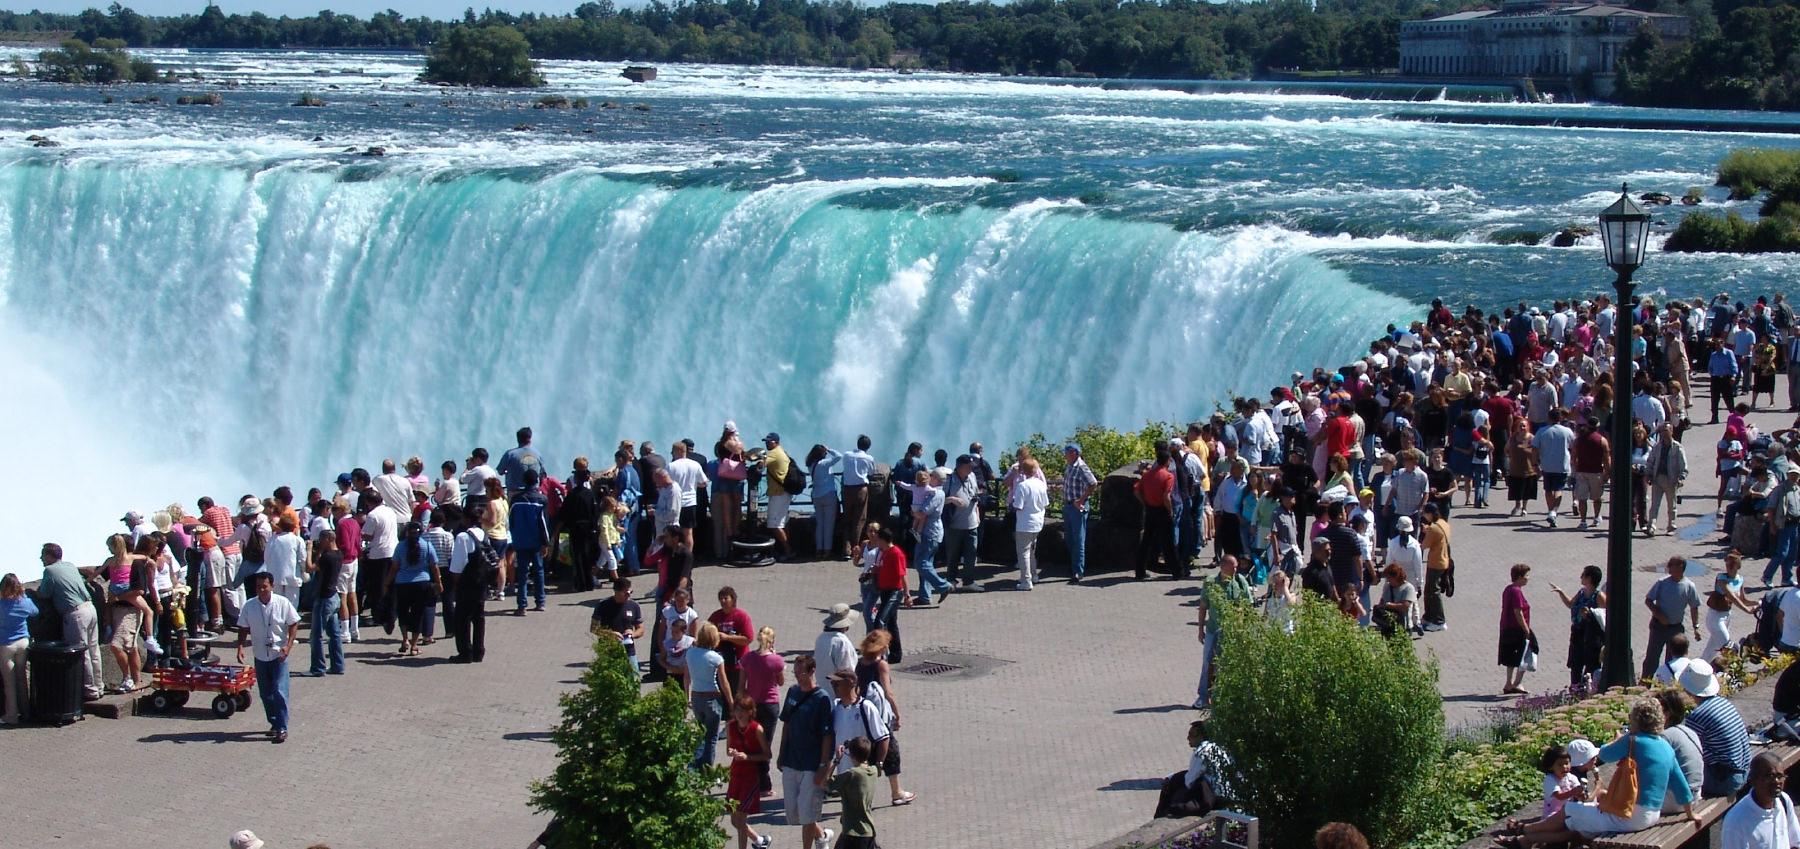 12 Million People Visit Niagara Falls Every Year